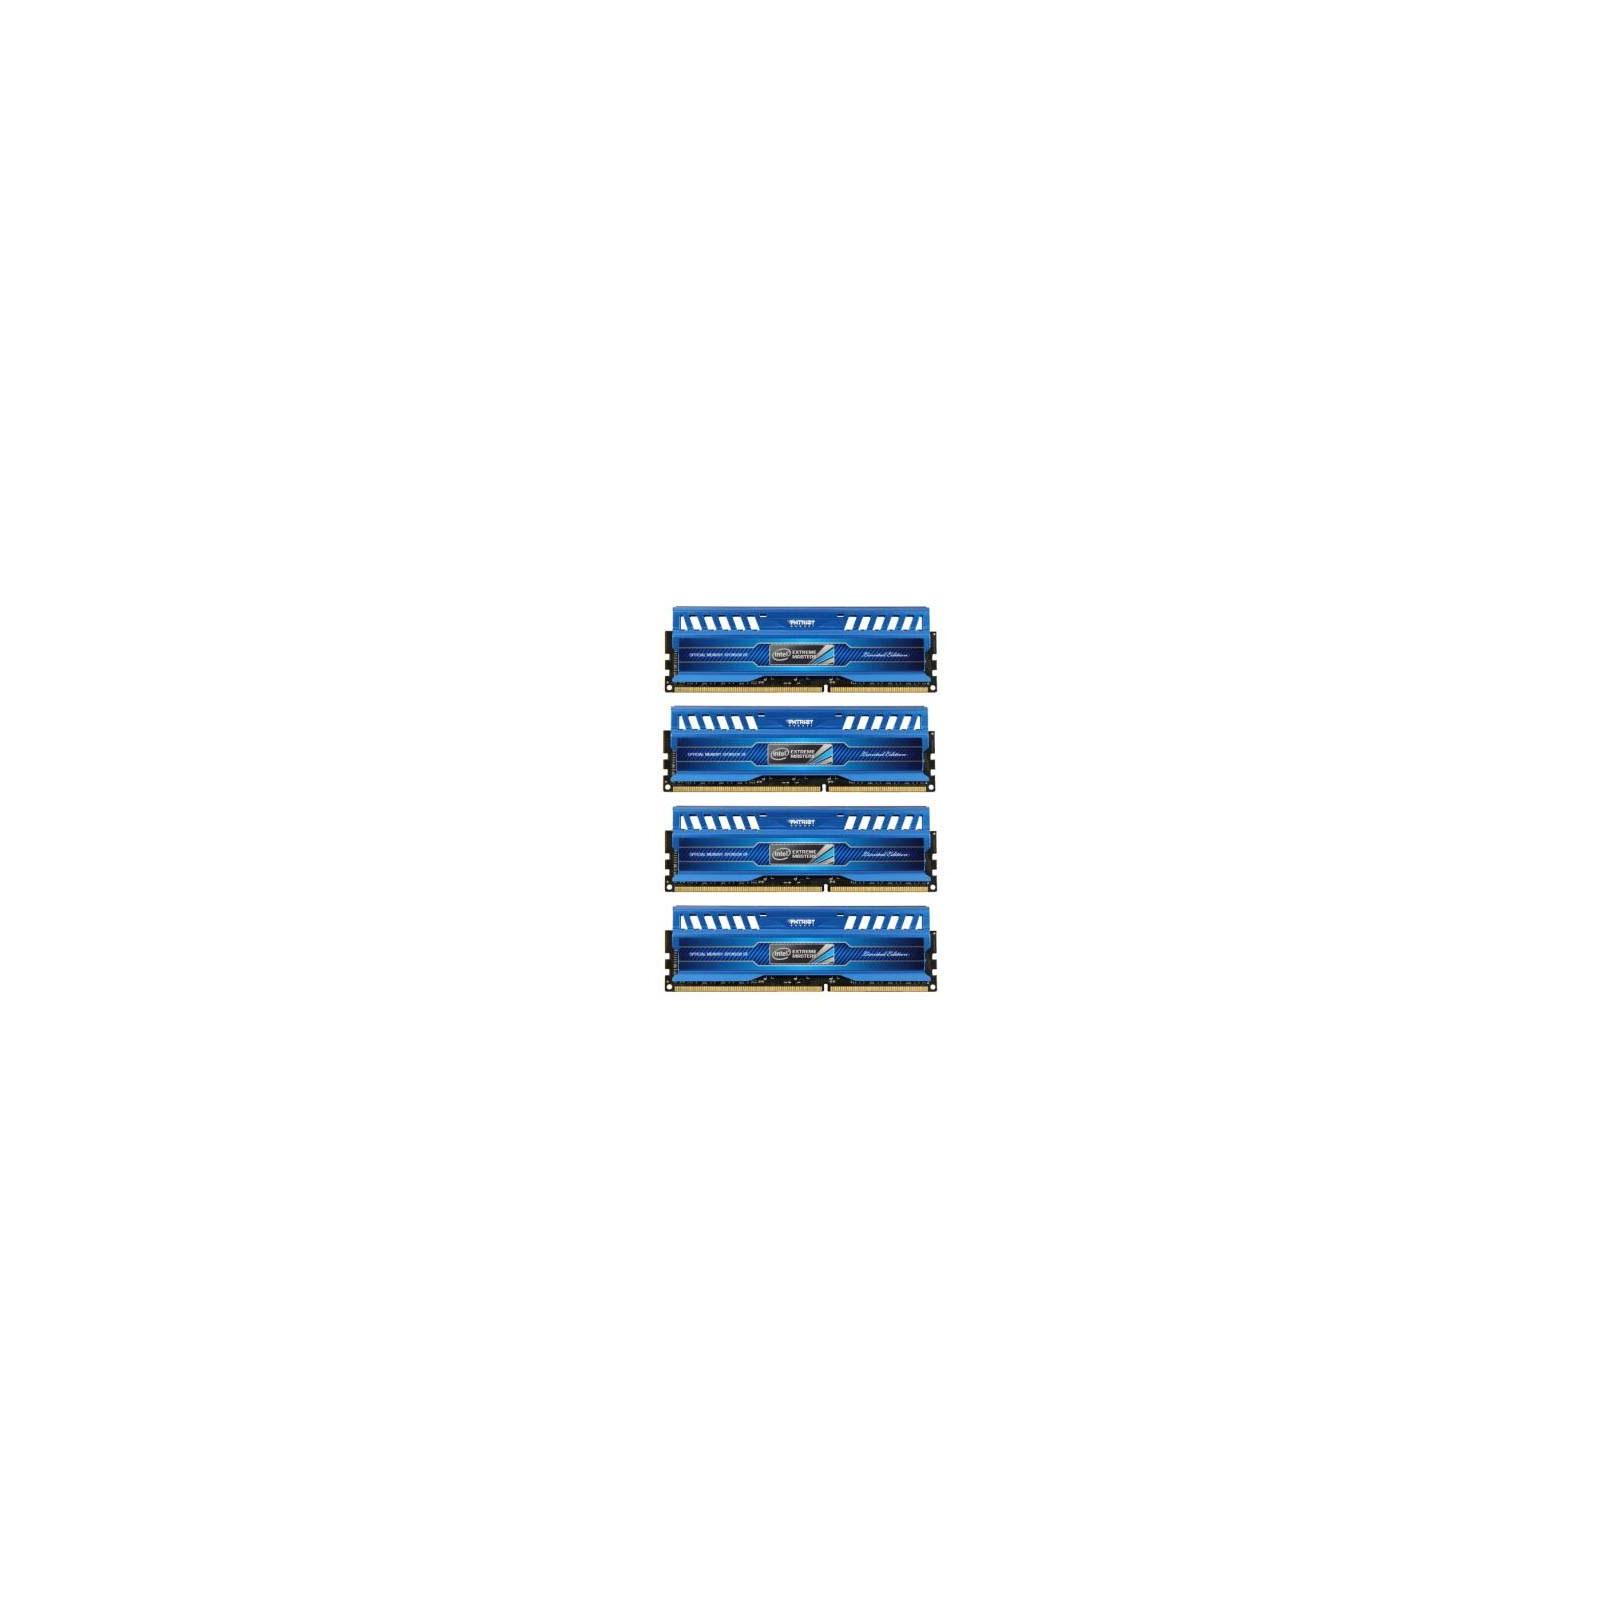 Модуль памяти для компьютера DDR3 16GB (4x4GB) 2133 MHz Patriot (PVI316G213C1QK)